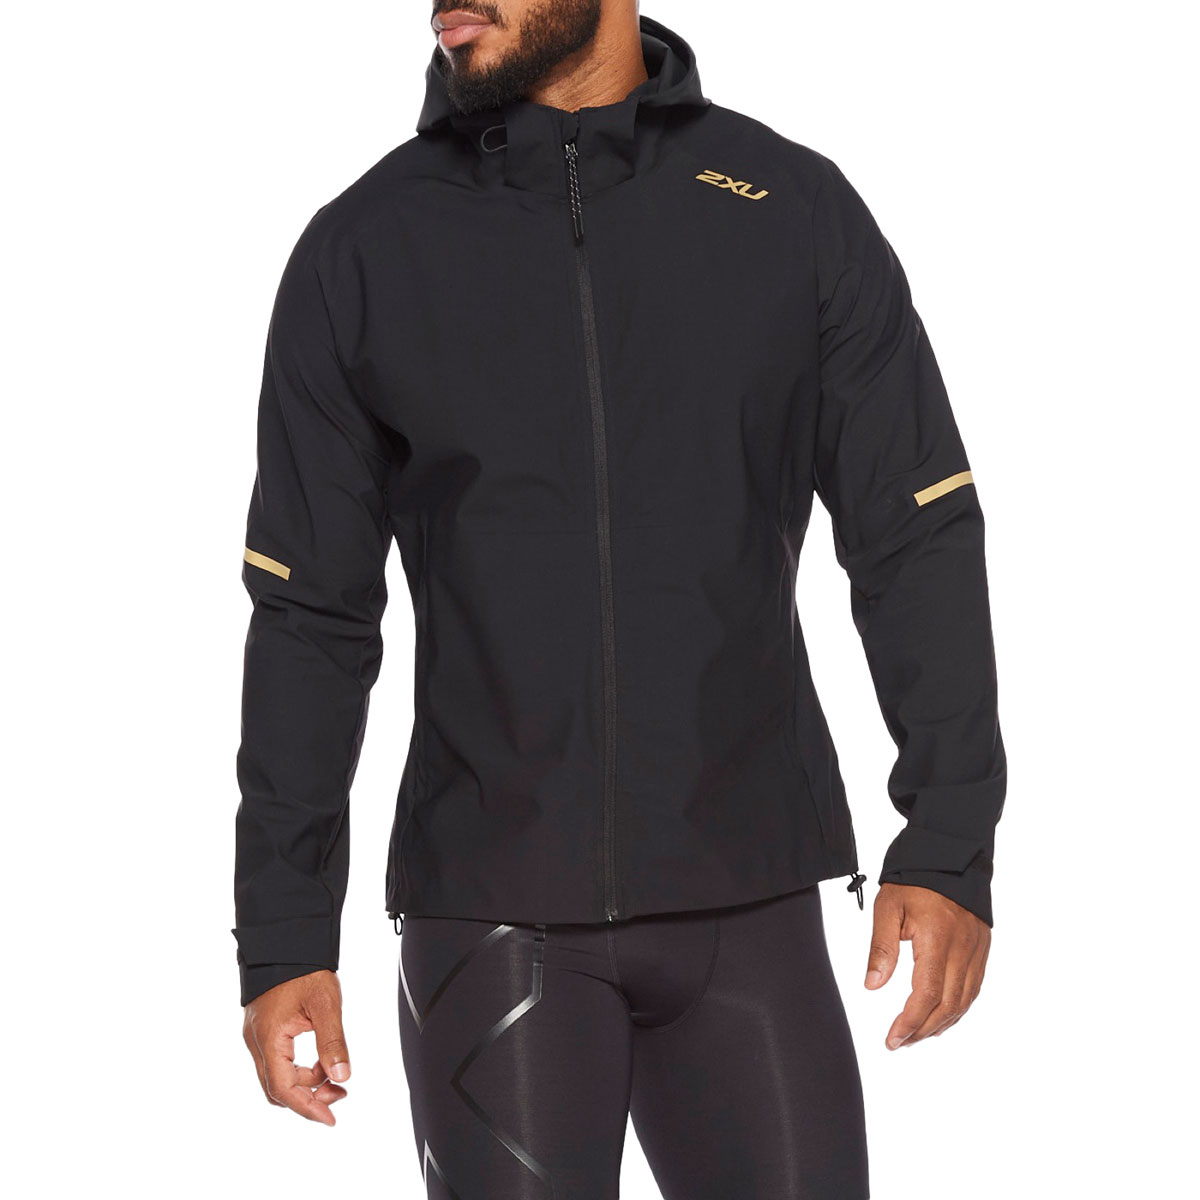 Imagen de 2XU GHST Waterproof Chaqueta para hombre - black/gold reflective